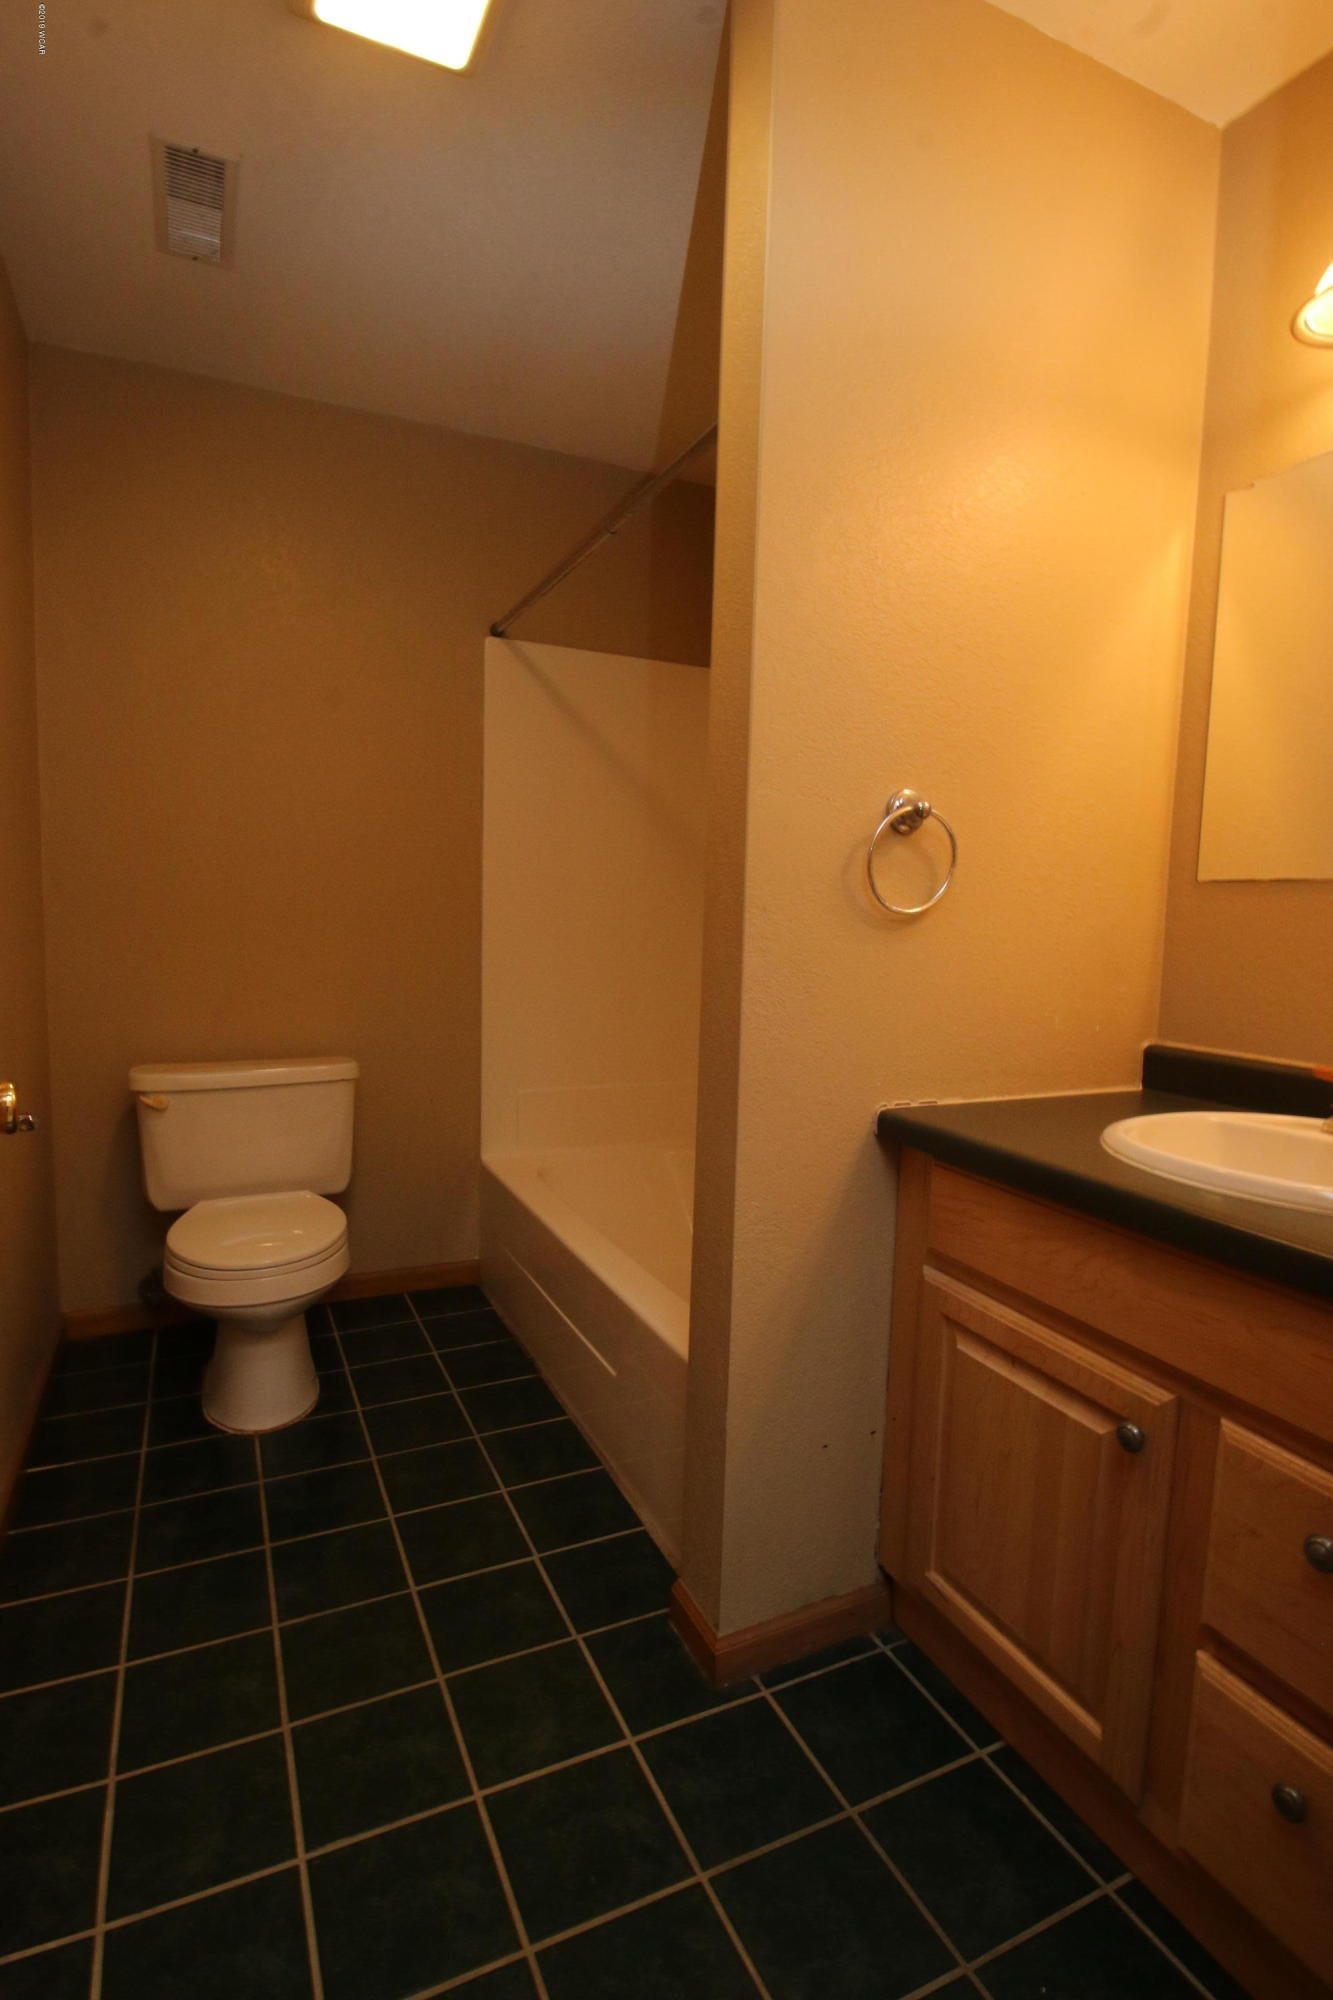 10997 199th Avenue,New London,3 Bedrooms Bedrooms,2 BathroomsBathrooms,Single Family,199th Avenue,6033398